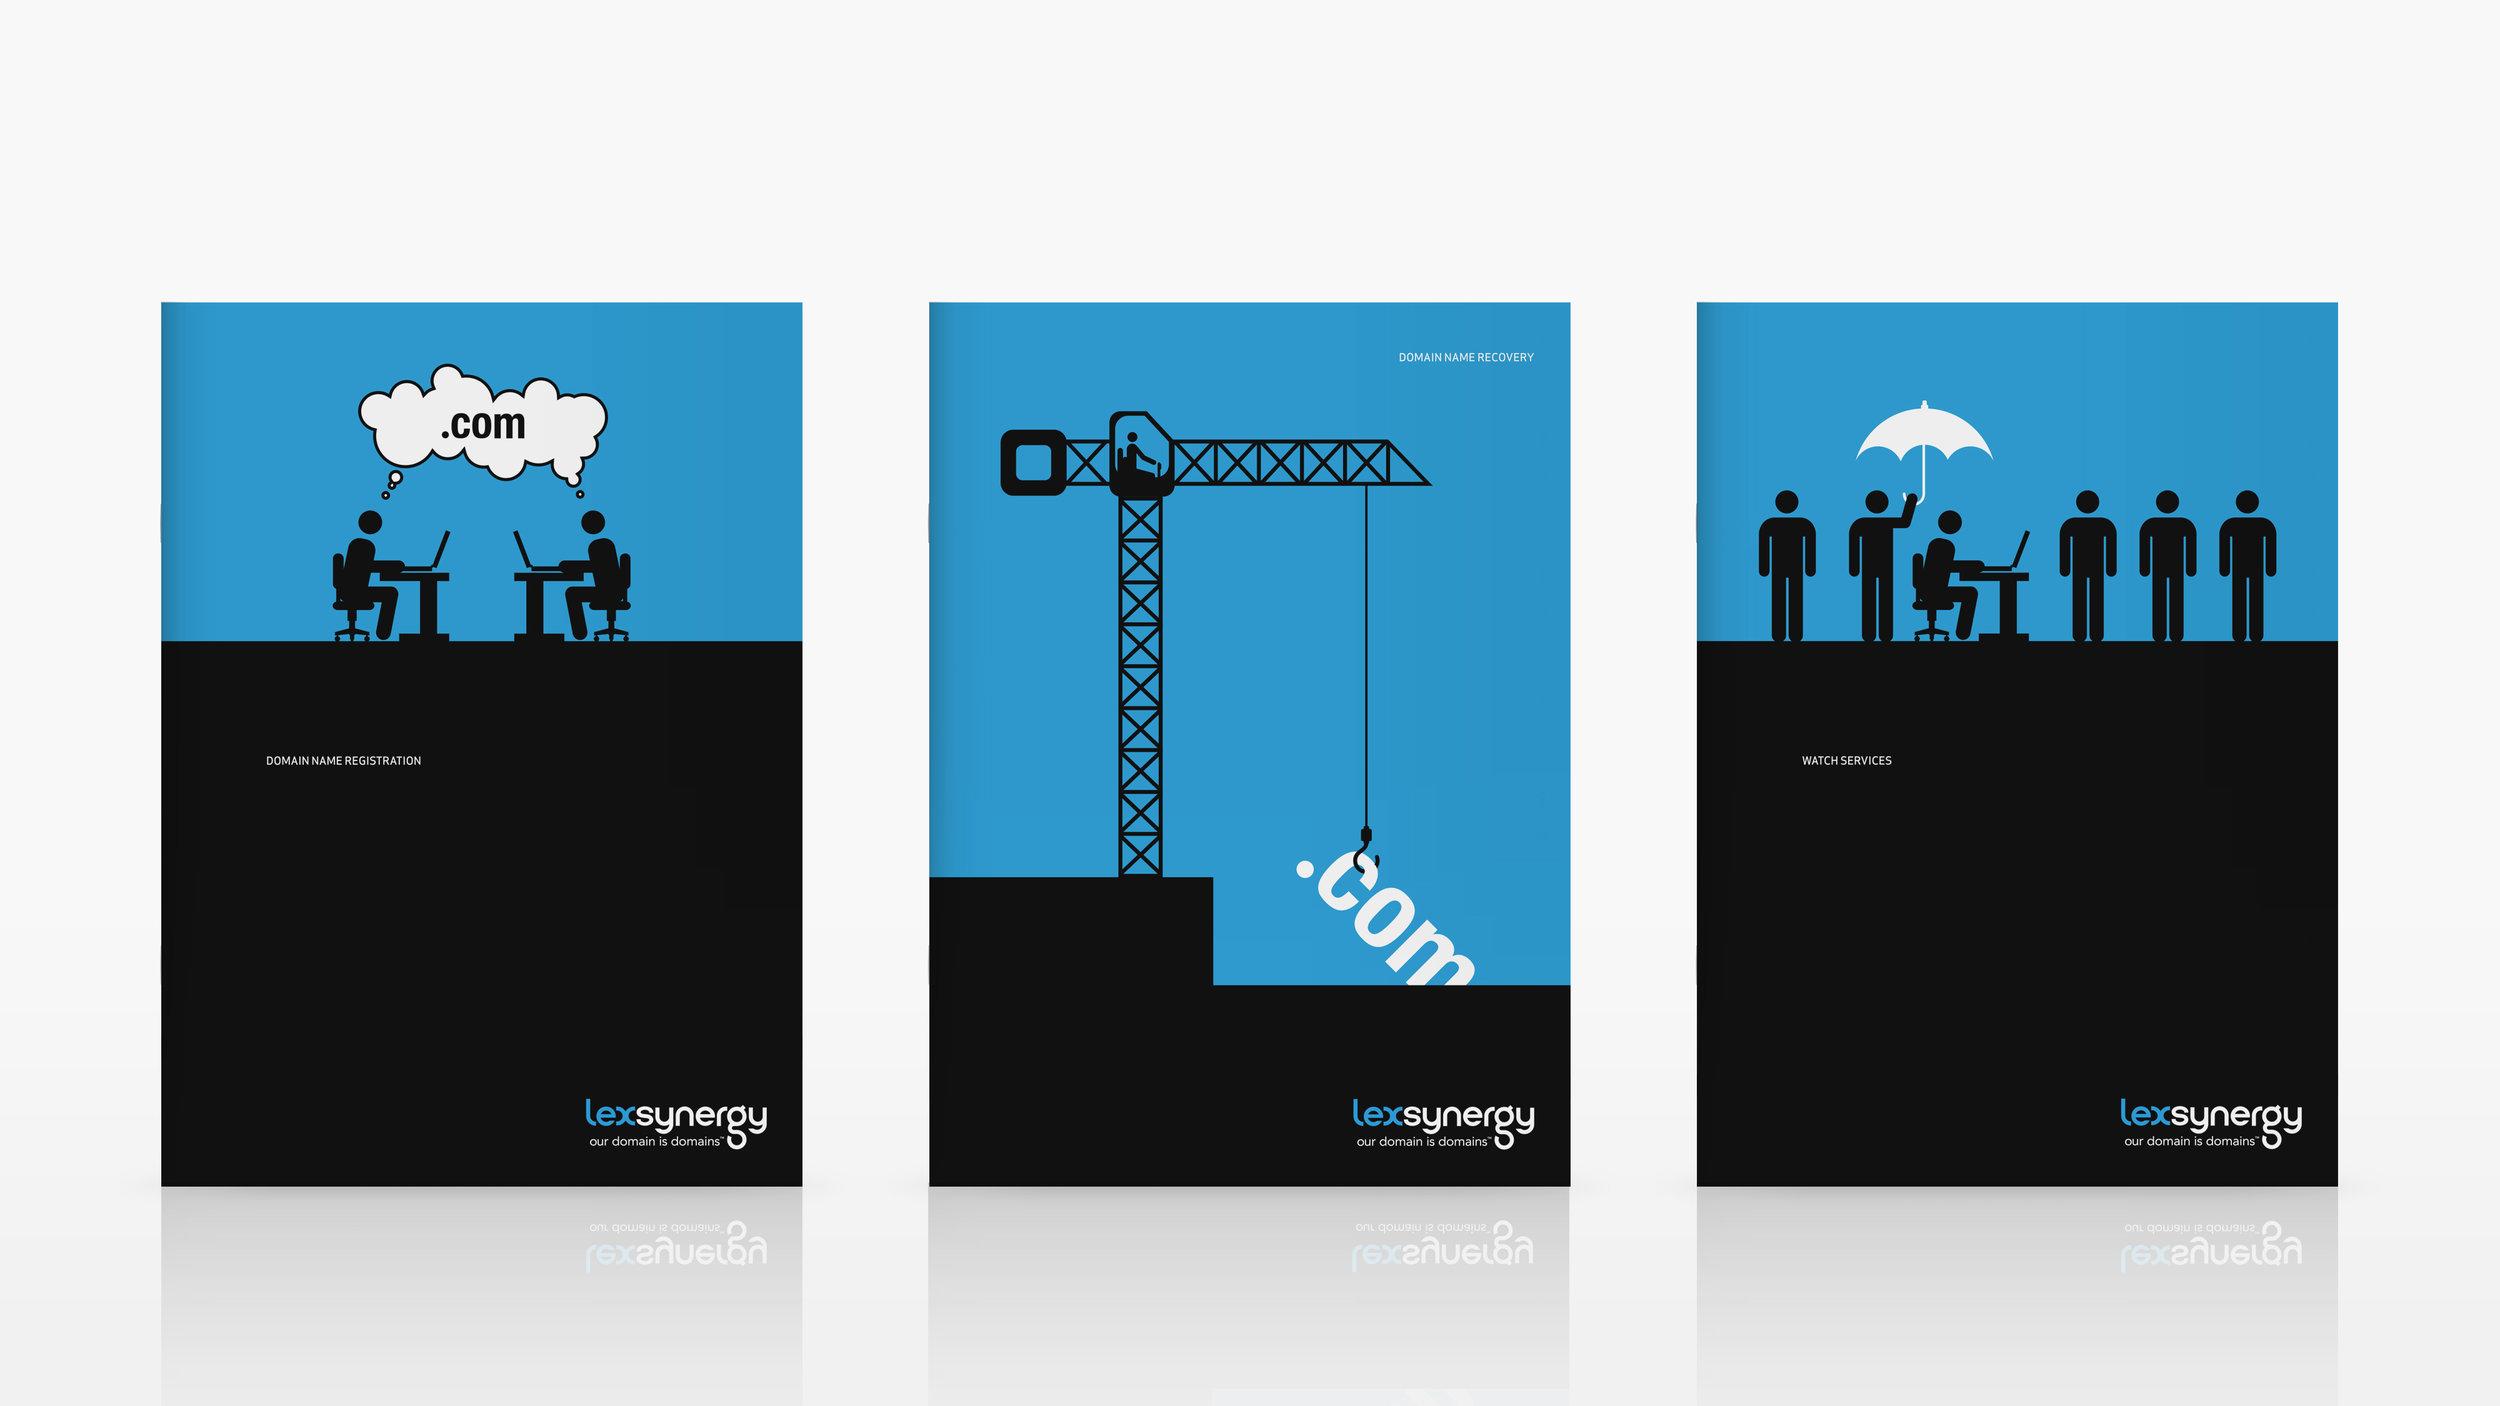 Brand_republica_brochure_design_lexsynergy_cover_03.jpg